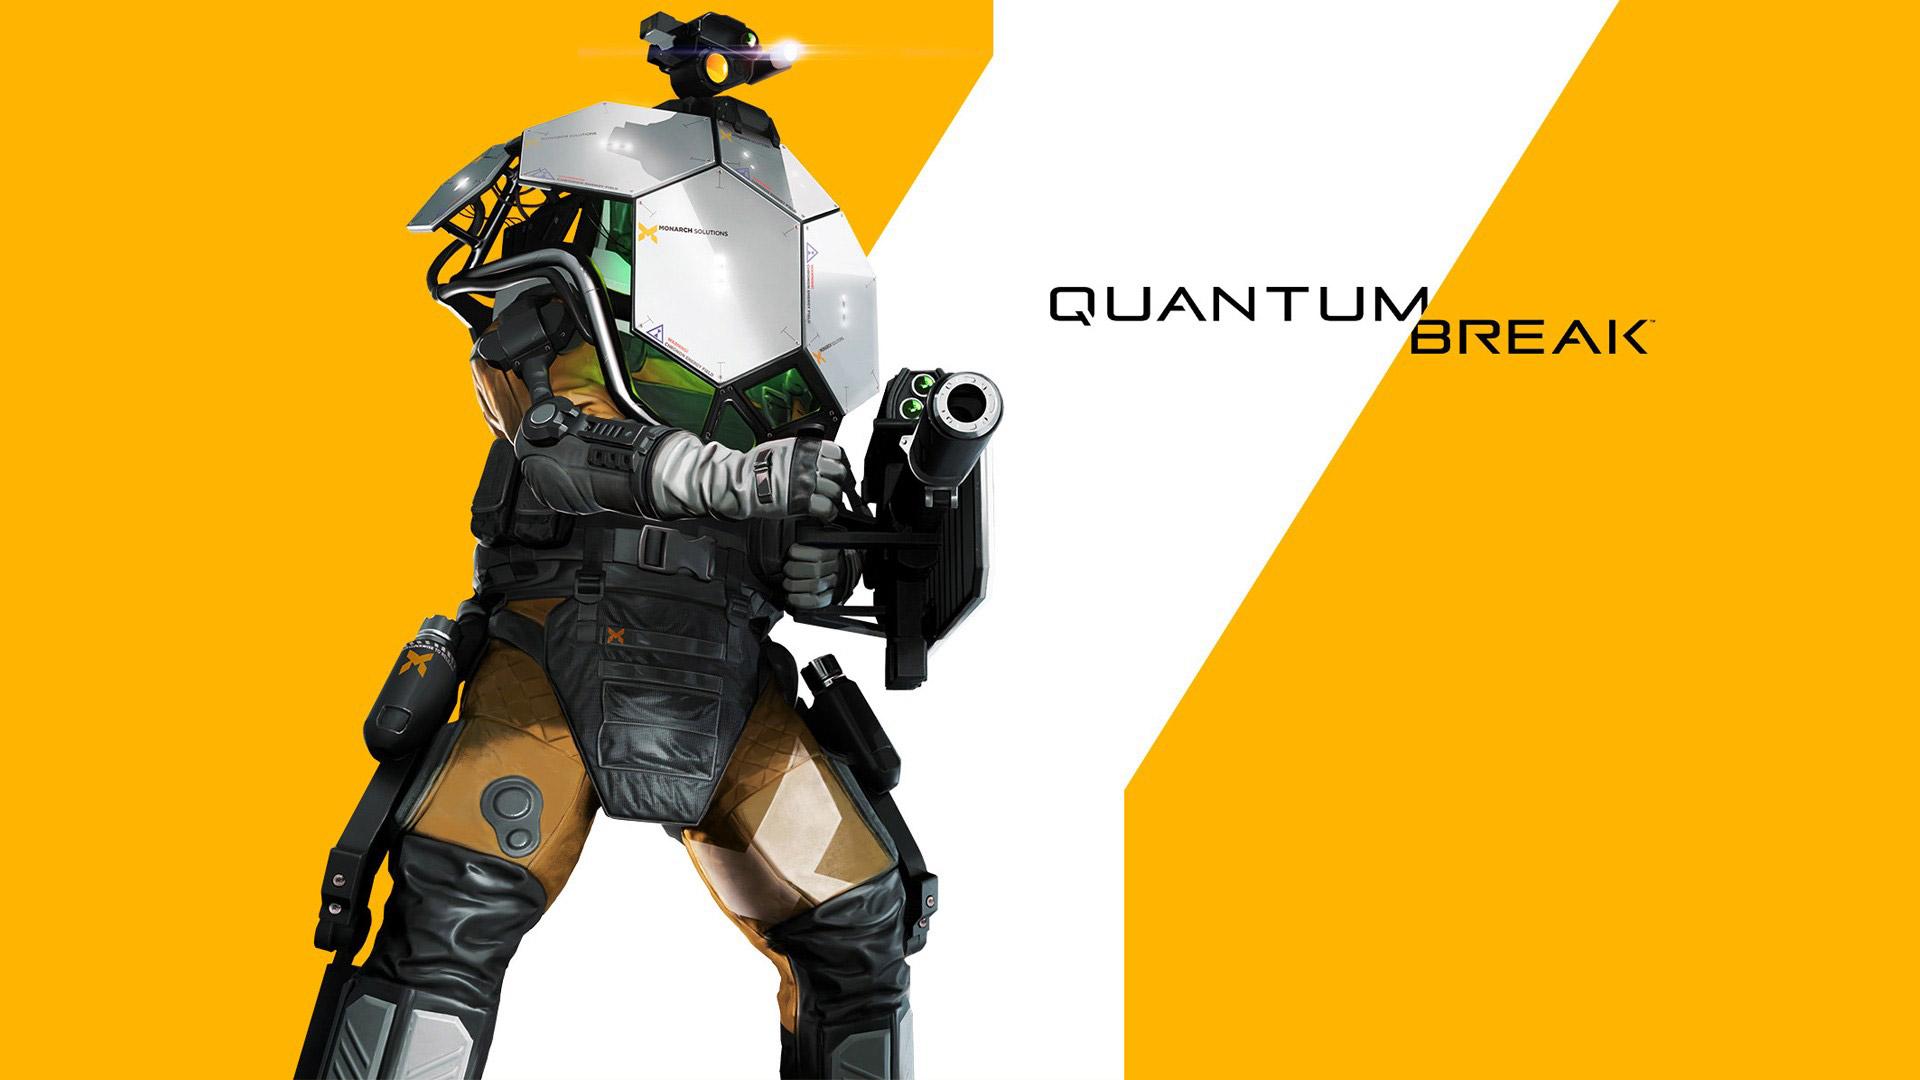 Quantum Break Wallpaper in 1920x1080